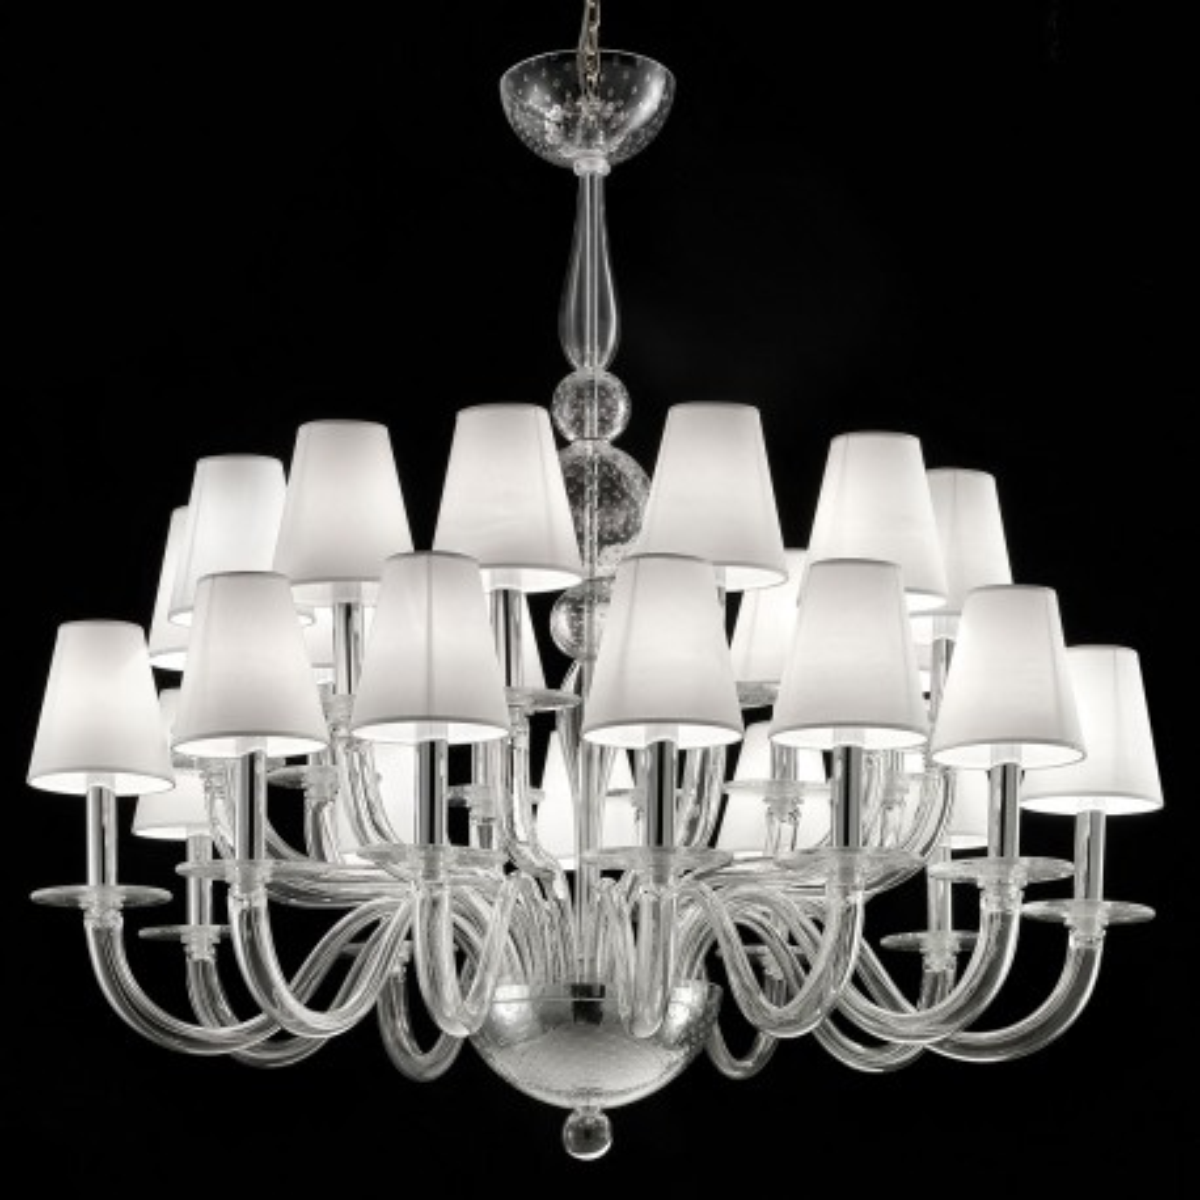 """Vasco"" Murano glas Kronleuchter - 12 + 12 flammig, transparent"